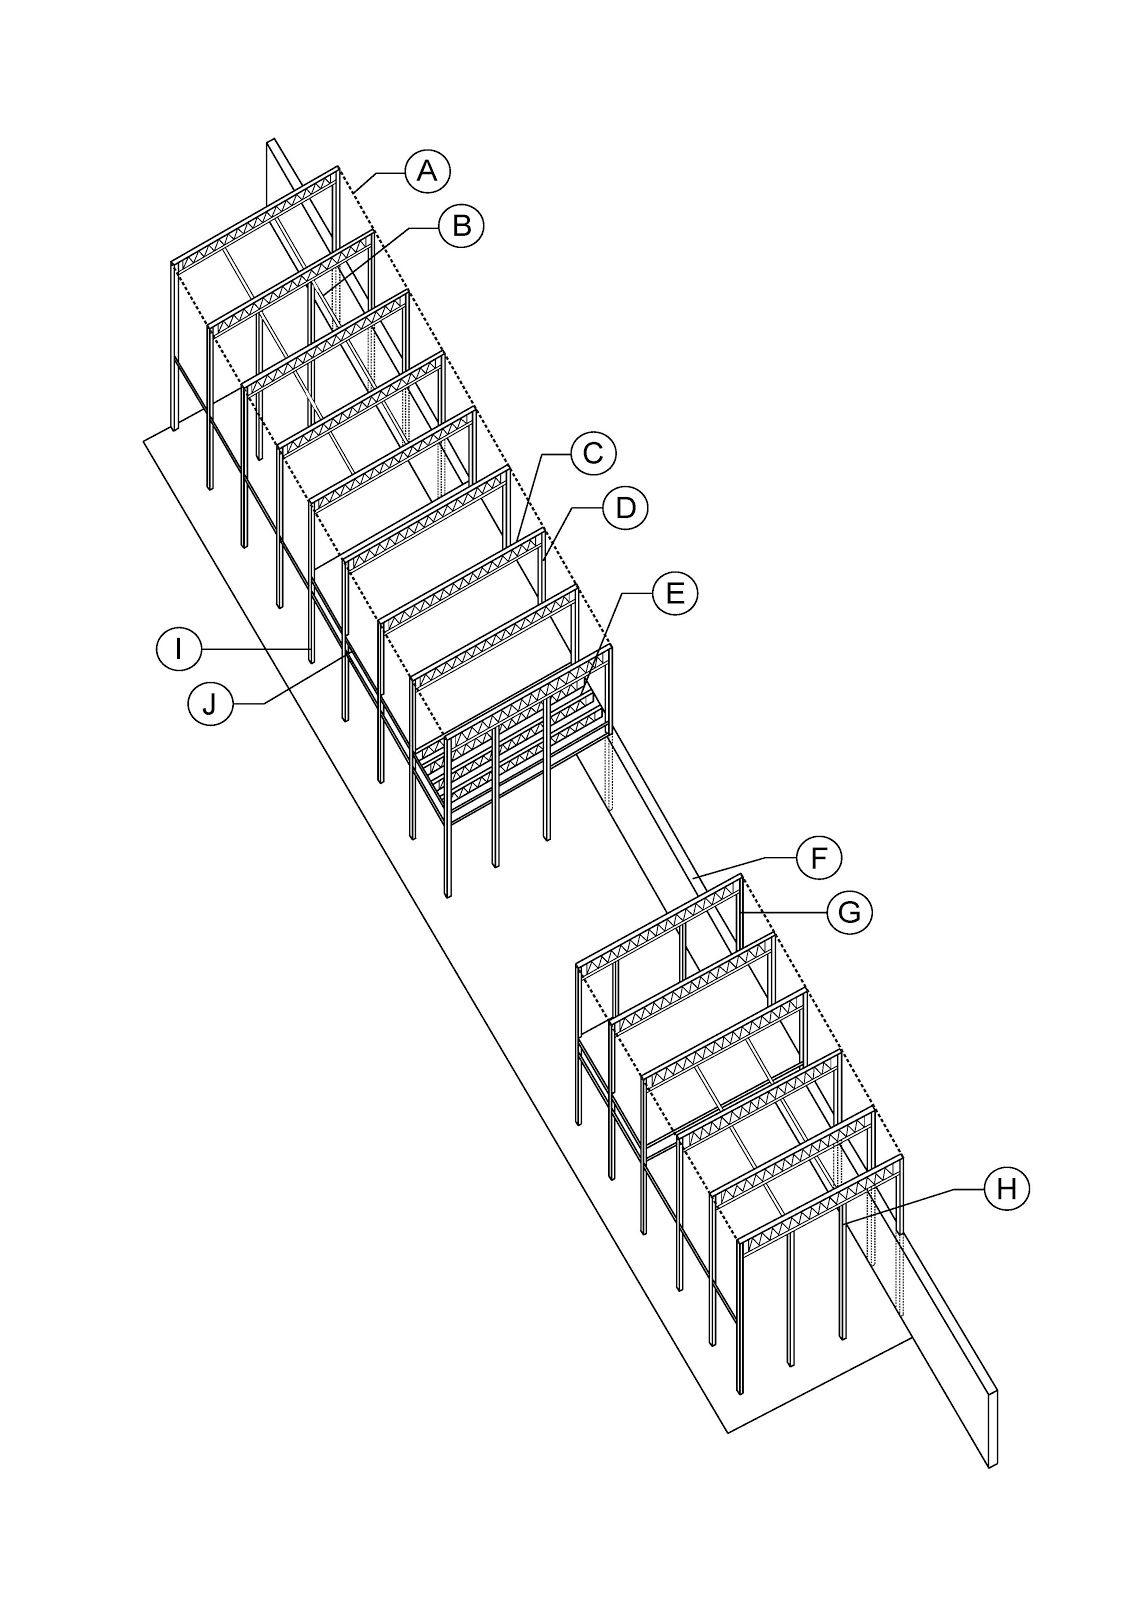 Eames House: Eames House Frame Construction | Framing | Pinterest ...